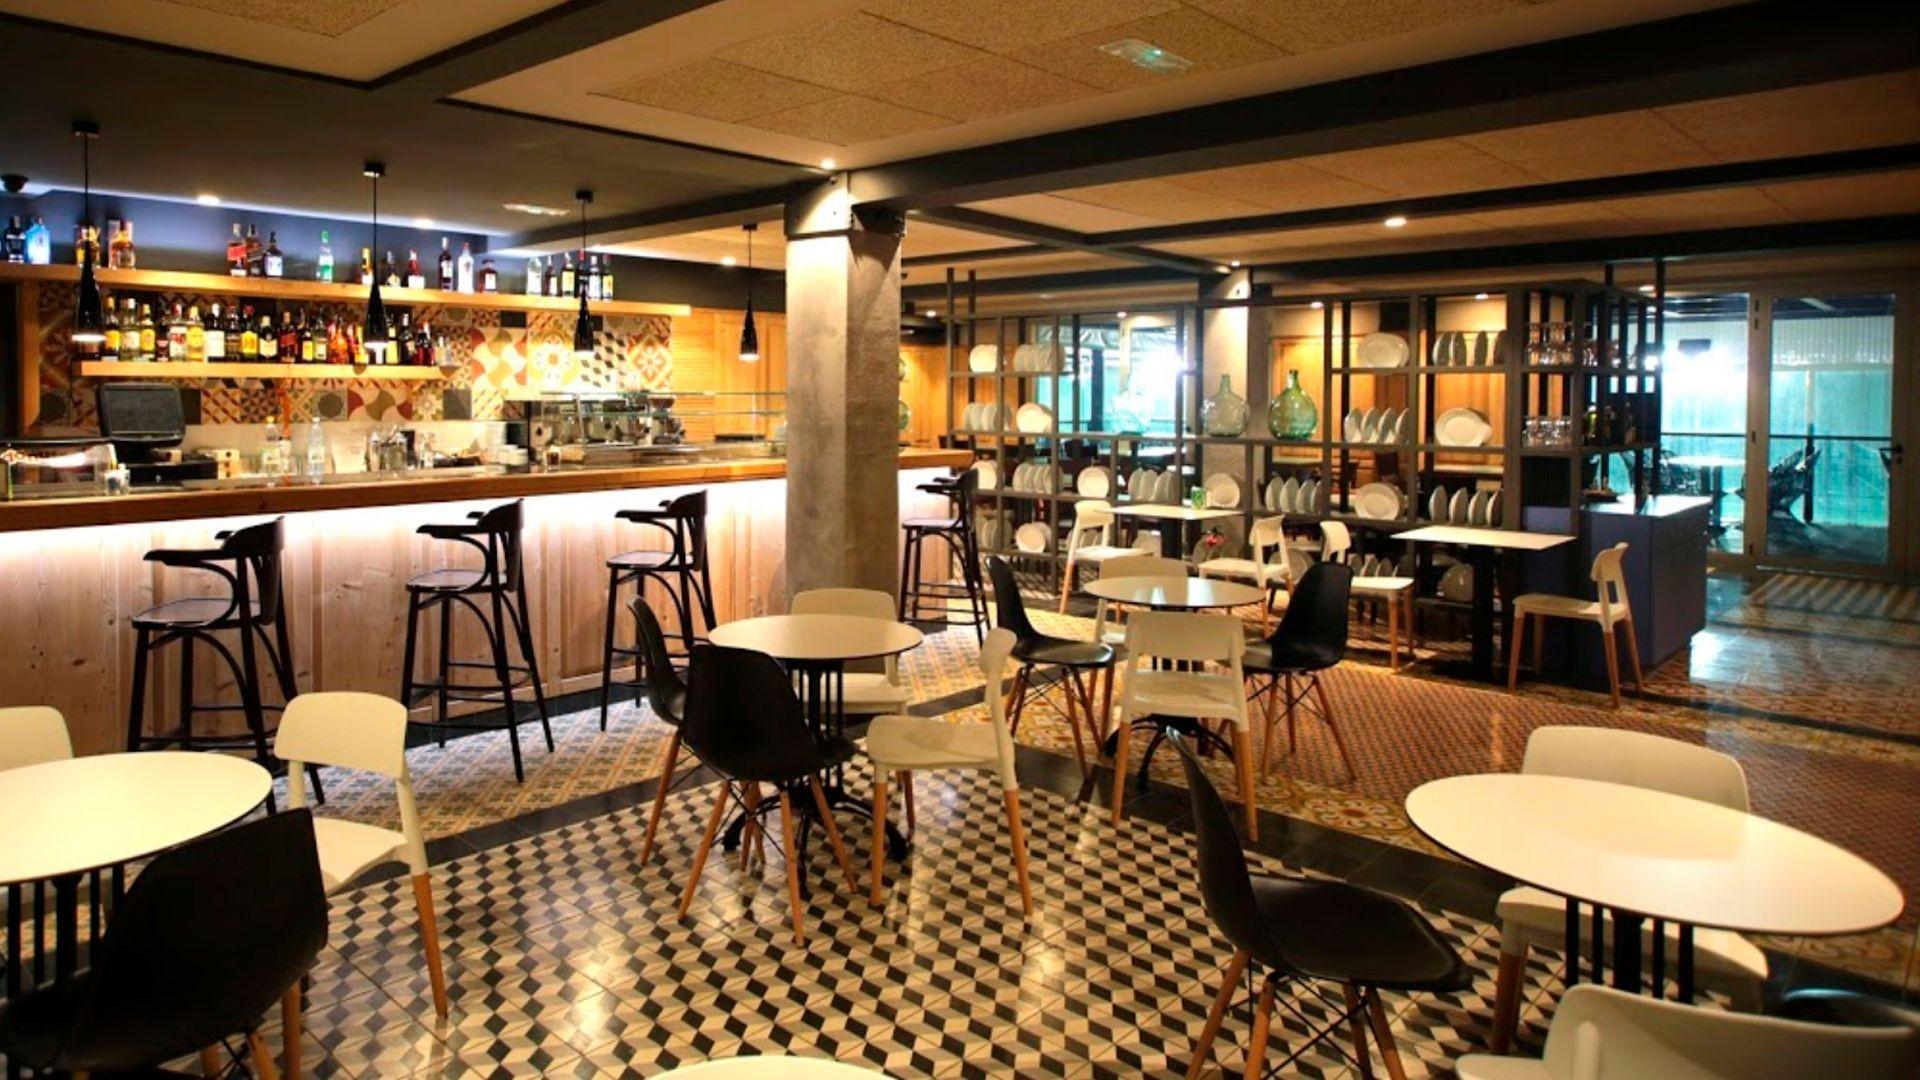 Restaurante de cocina internacional en Telde